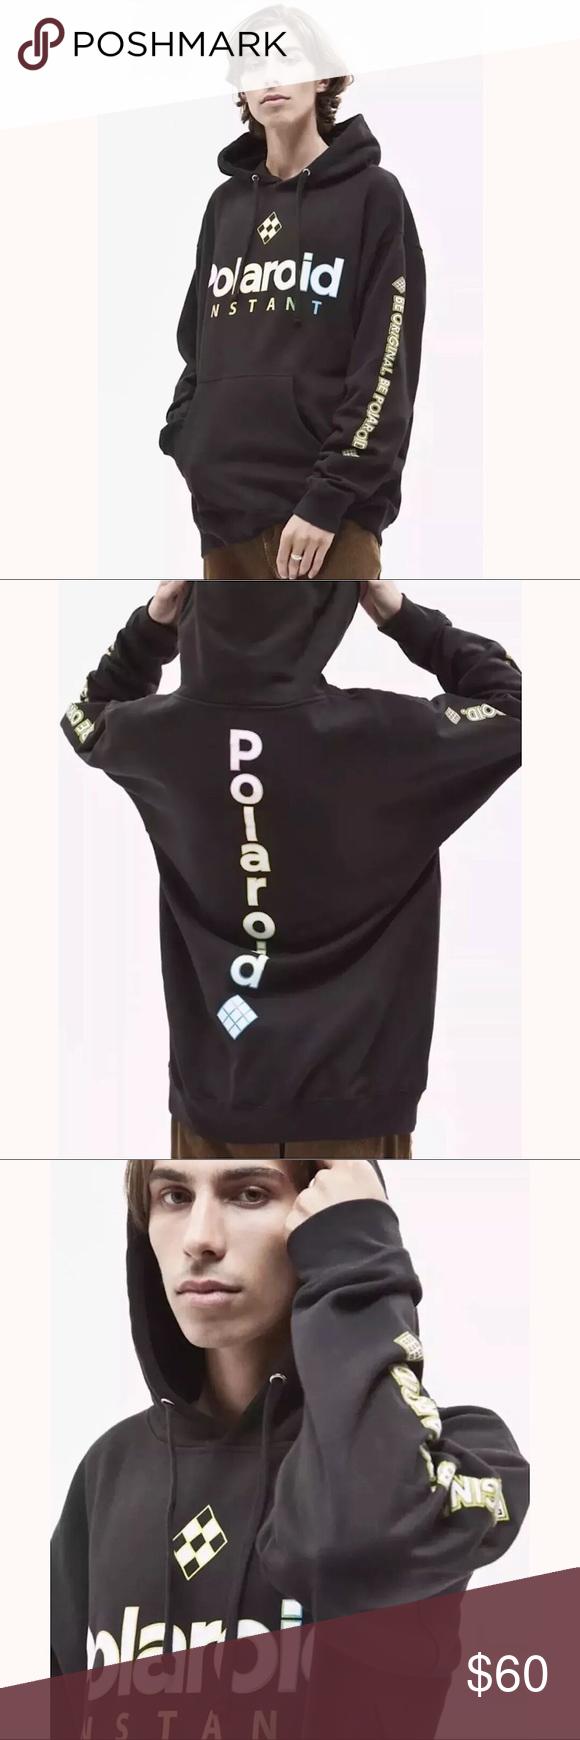 Pacsun Men S Polaroid Pullover Hoodie Black Pullover Hoodie Pacsun Mens Hoodies [ 1740 x 580 Pixel ]